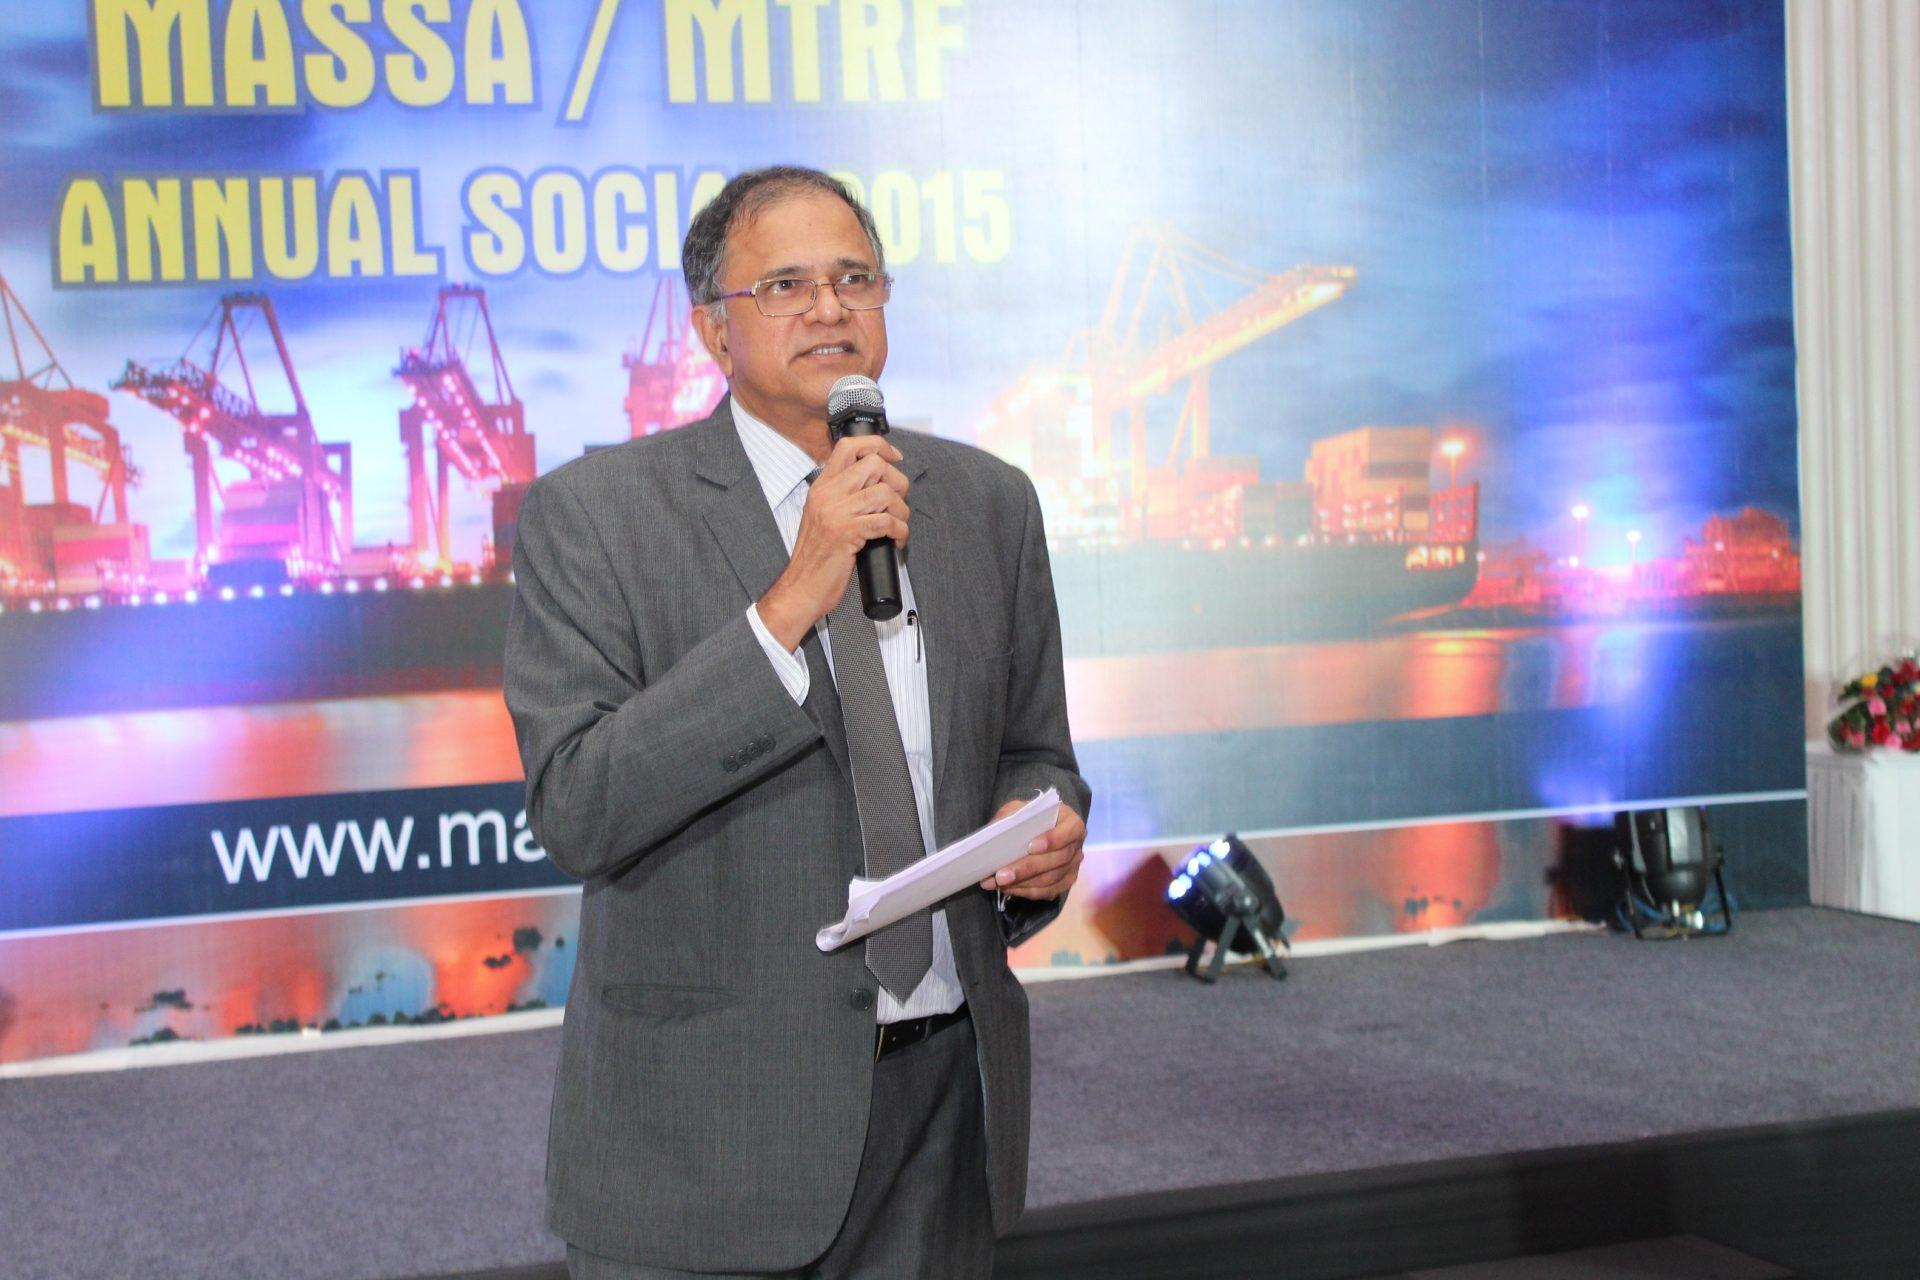 Capt Shiv Halbe MASSA chairman low